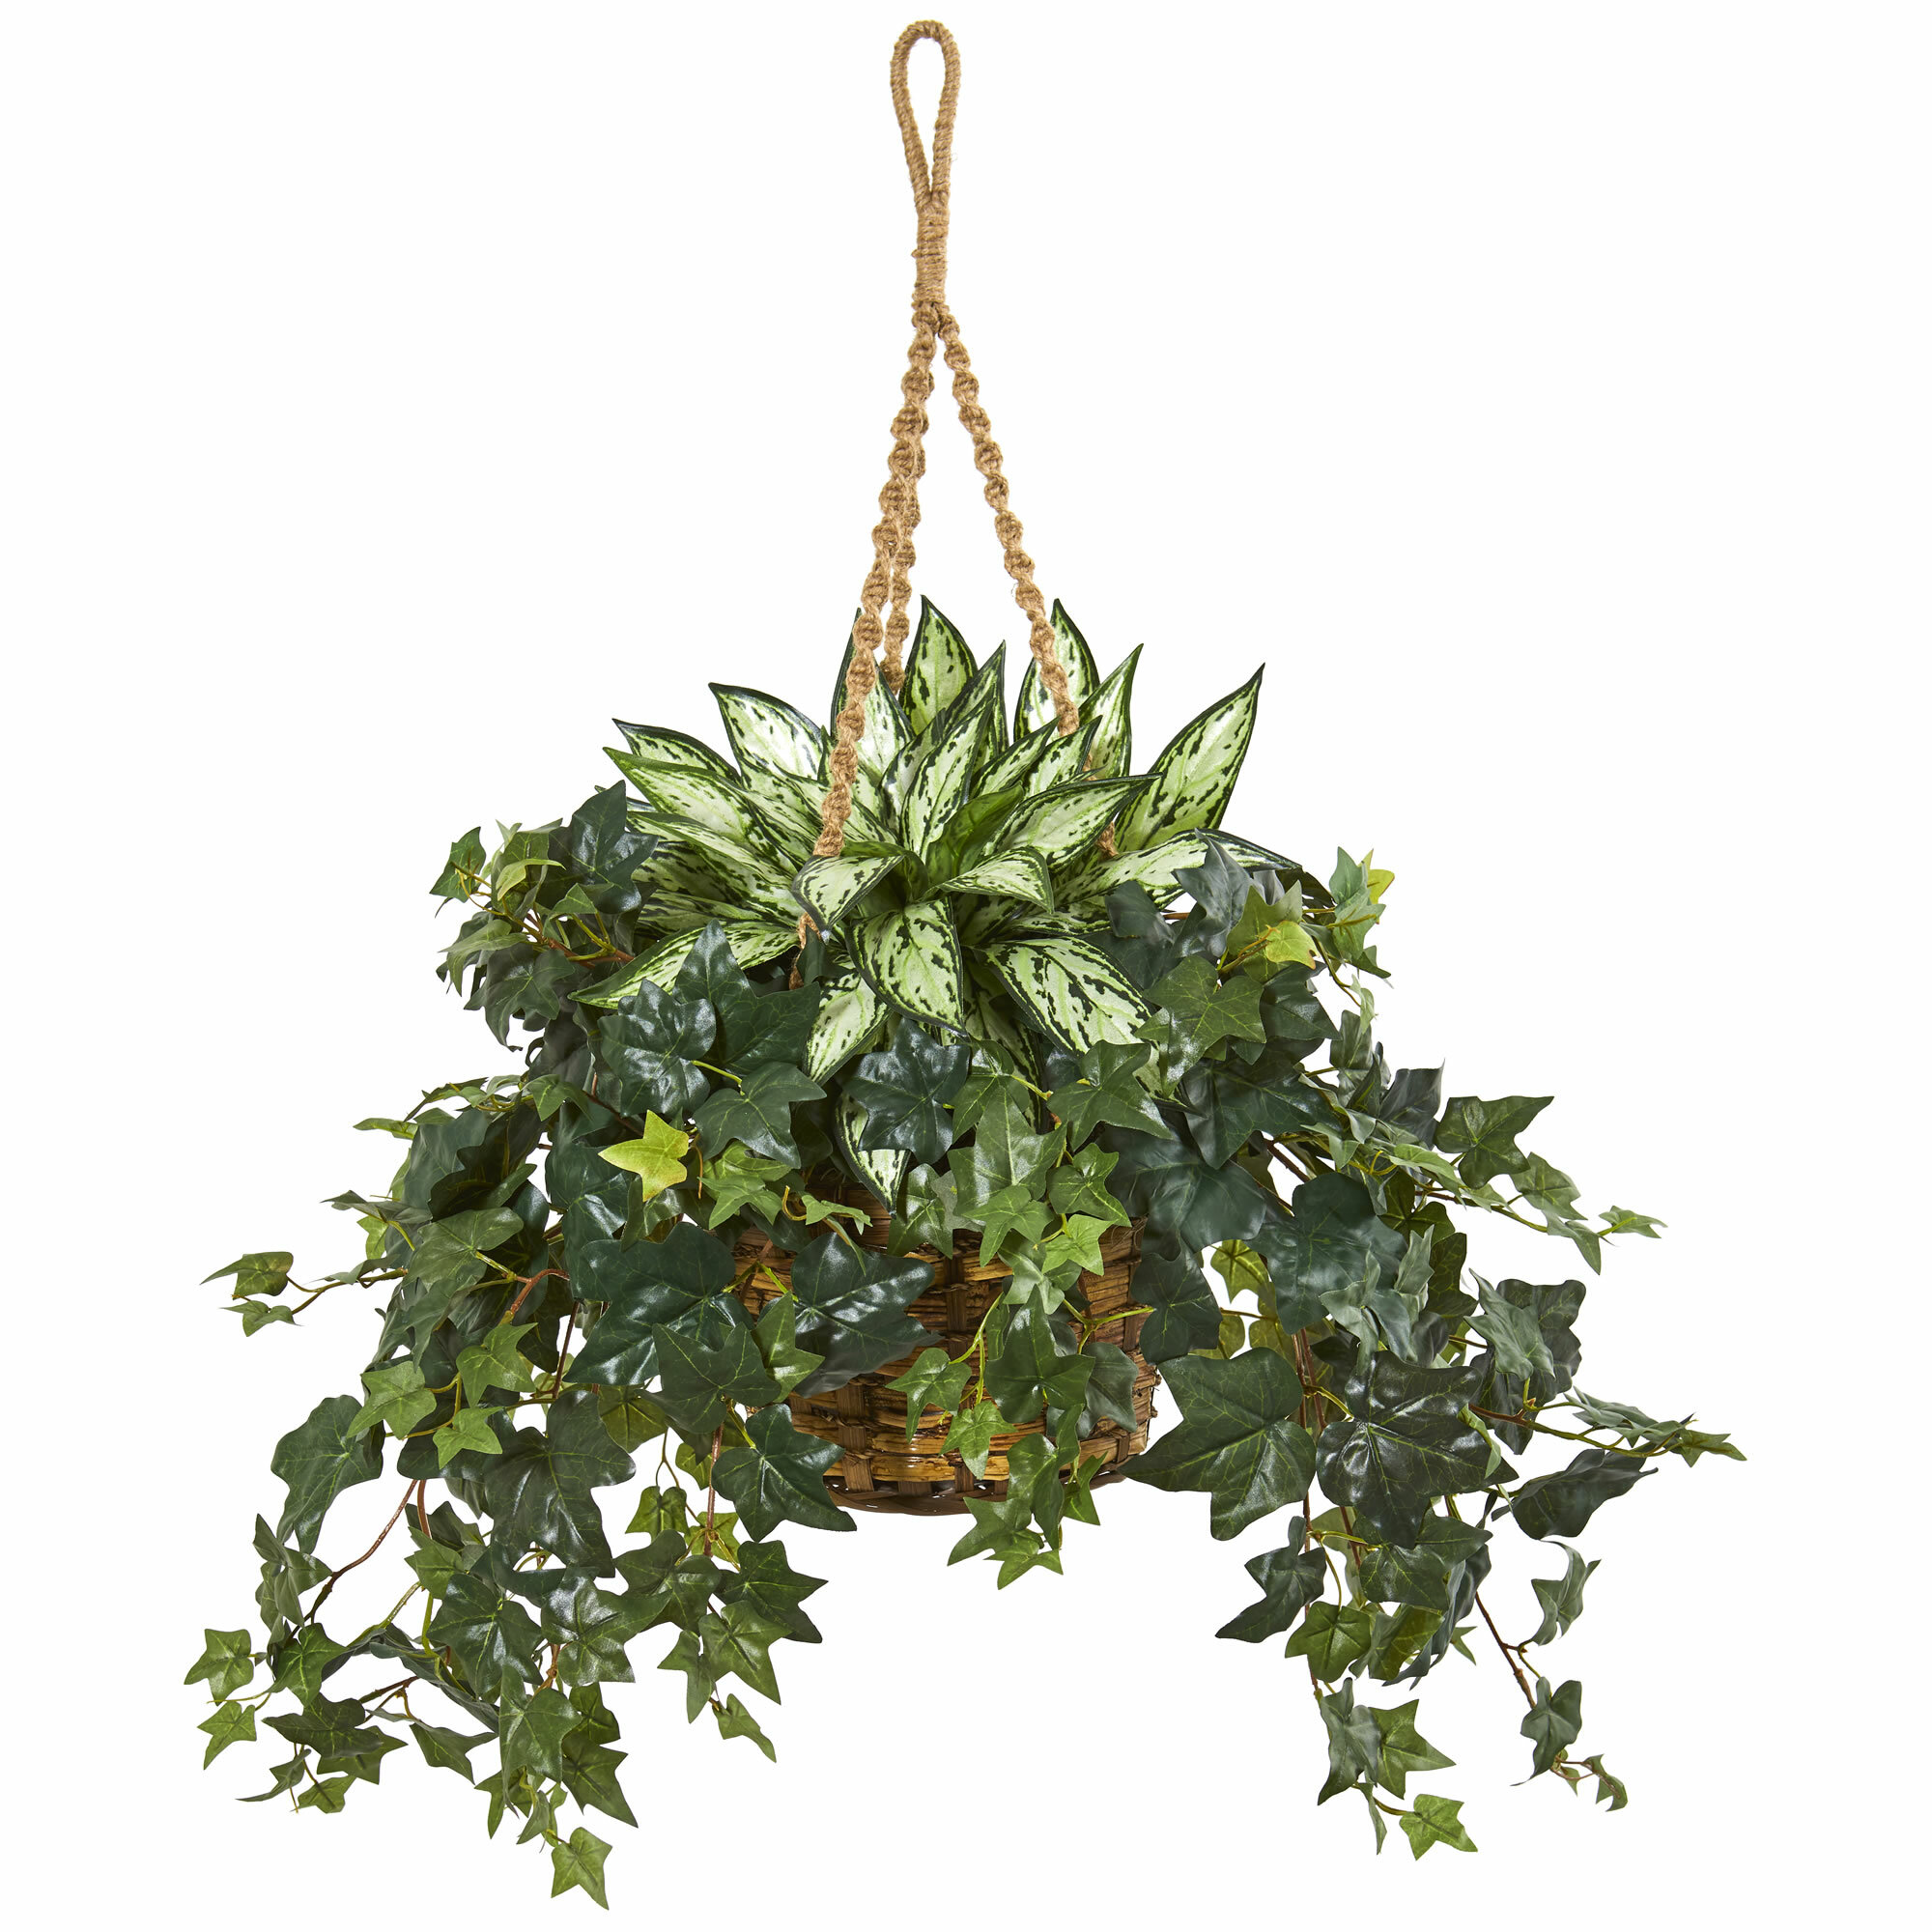 Charlton Home Artificial Foliage Plant In Basket Reviews Wayfair